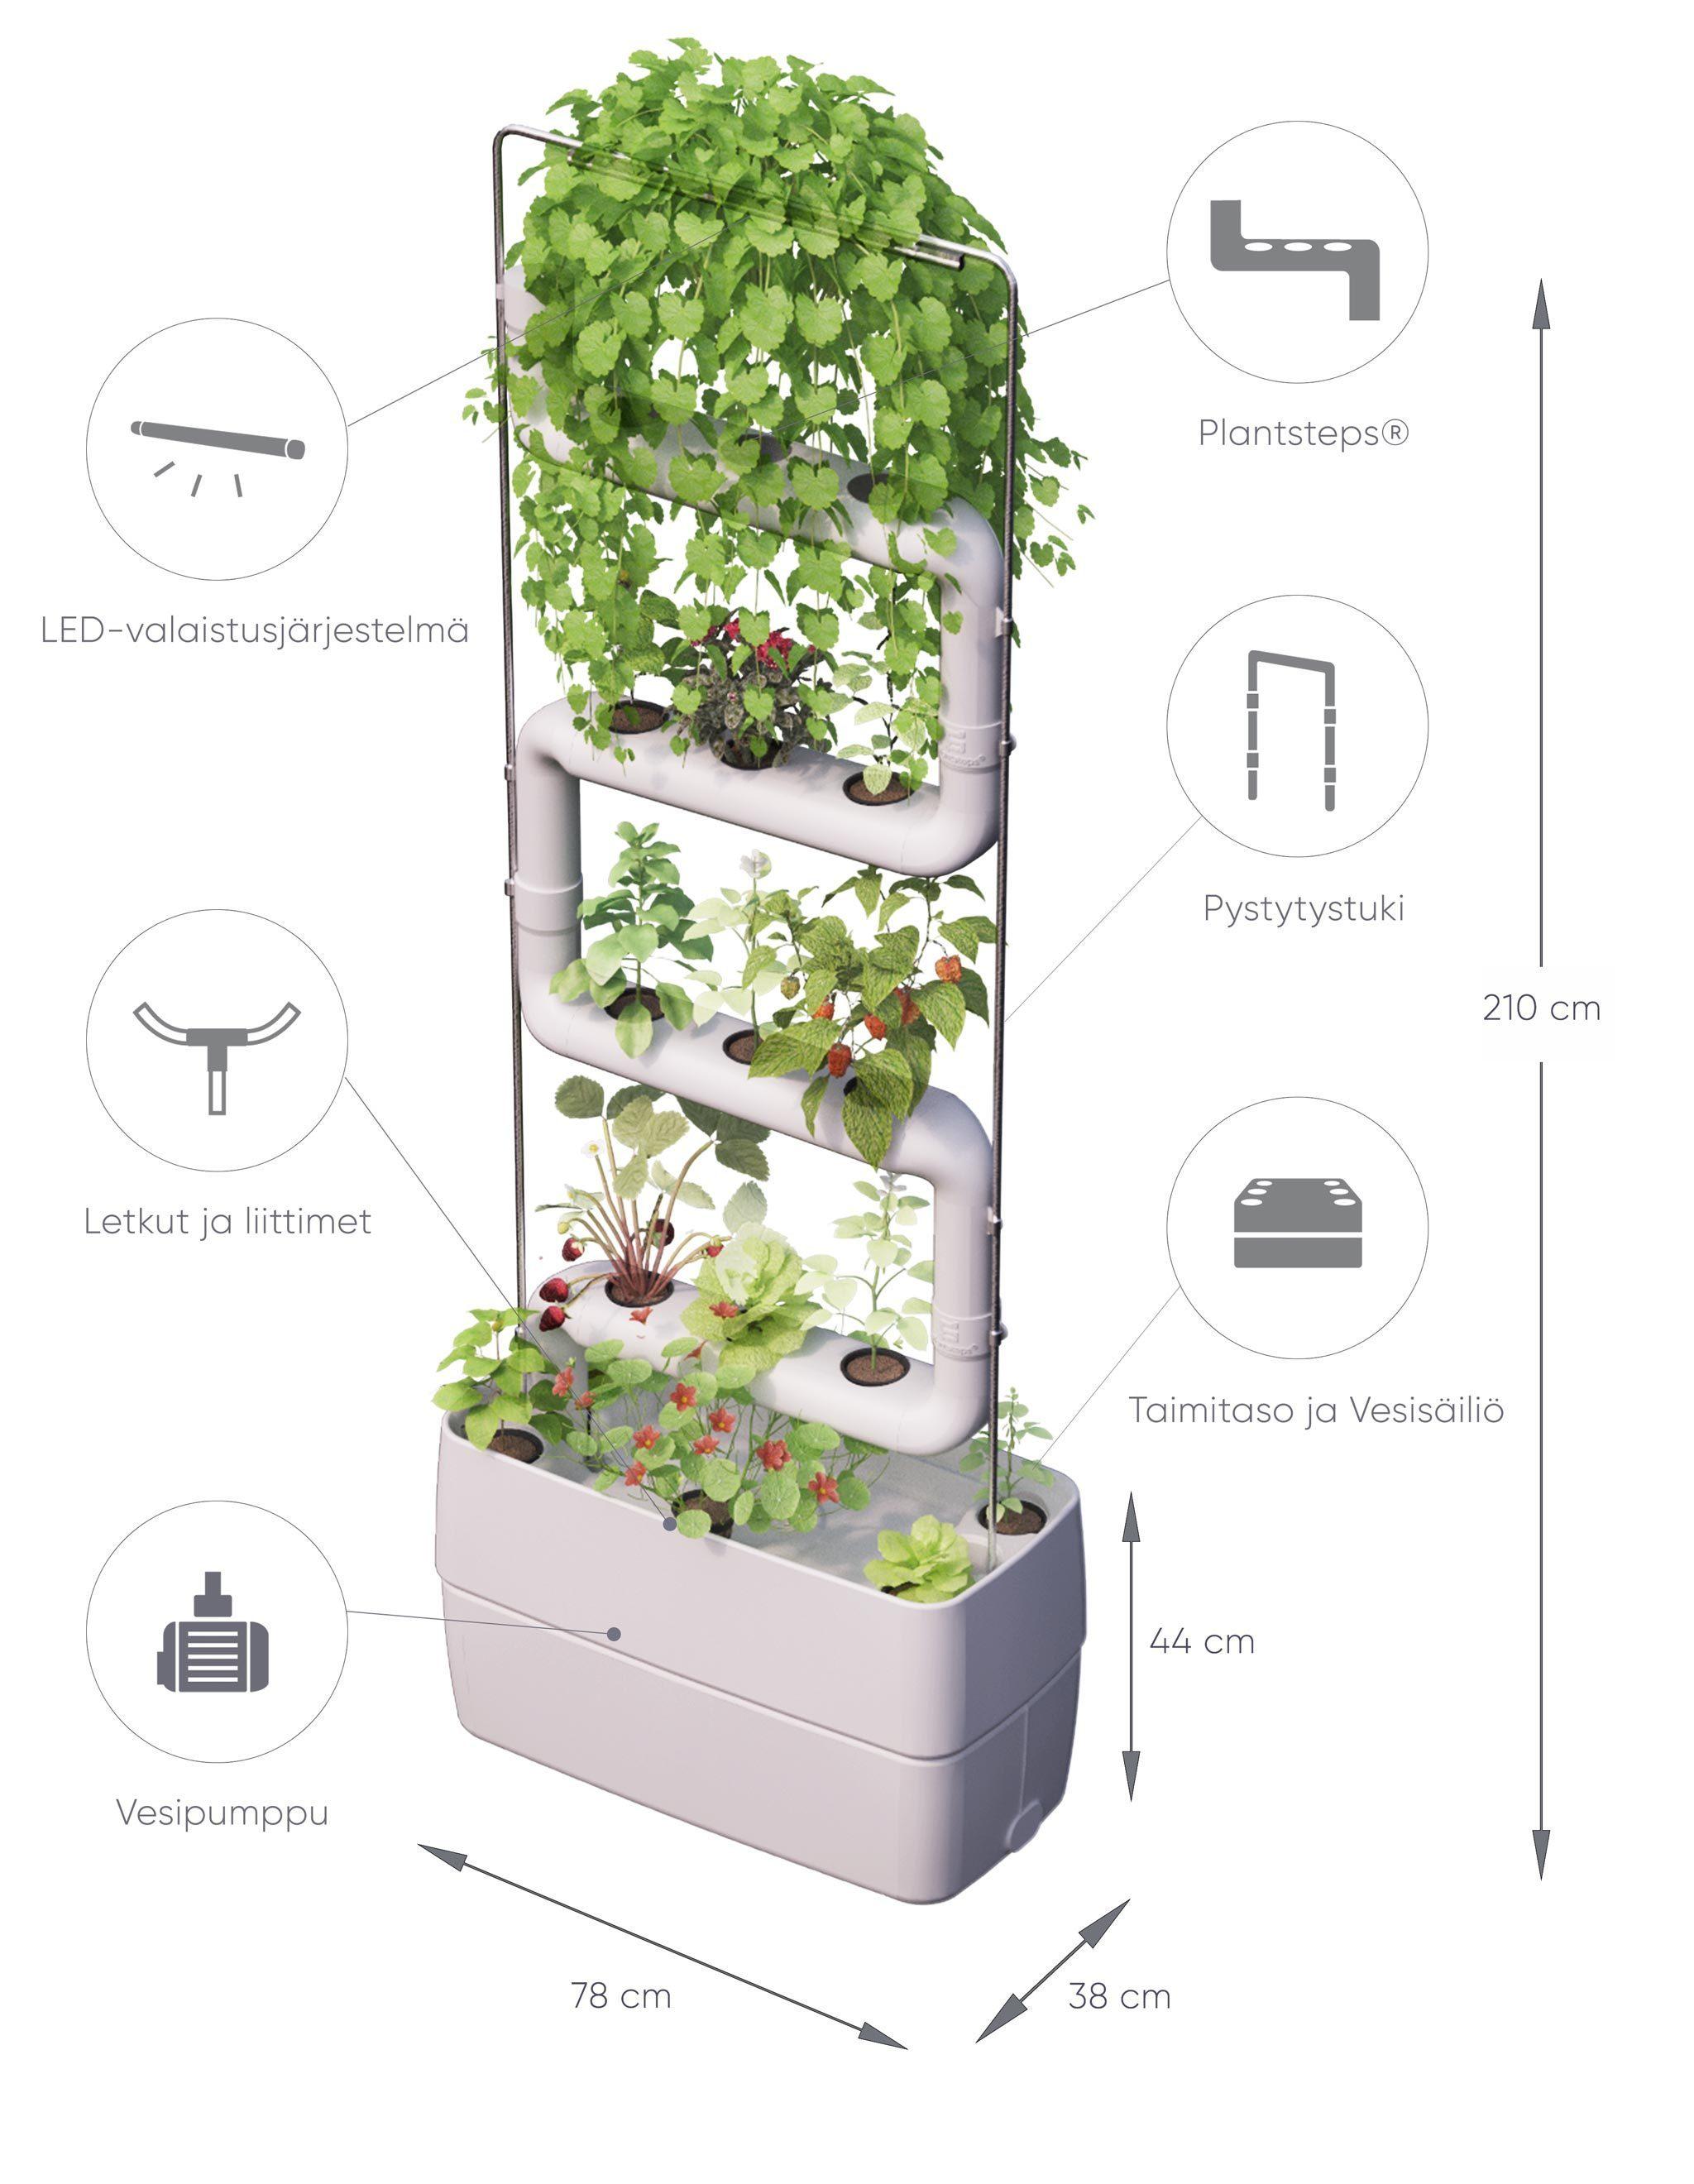 SUPRAGARDEN - The Vertical Hydroponic garden system for ...